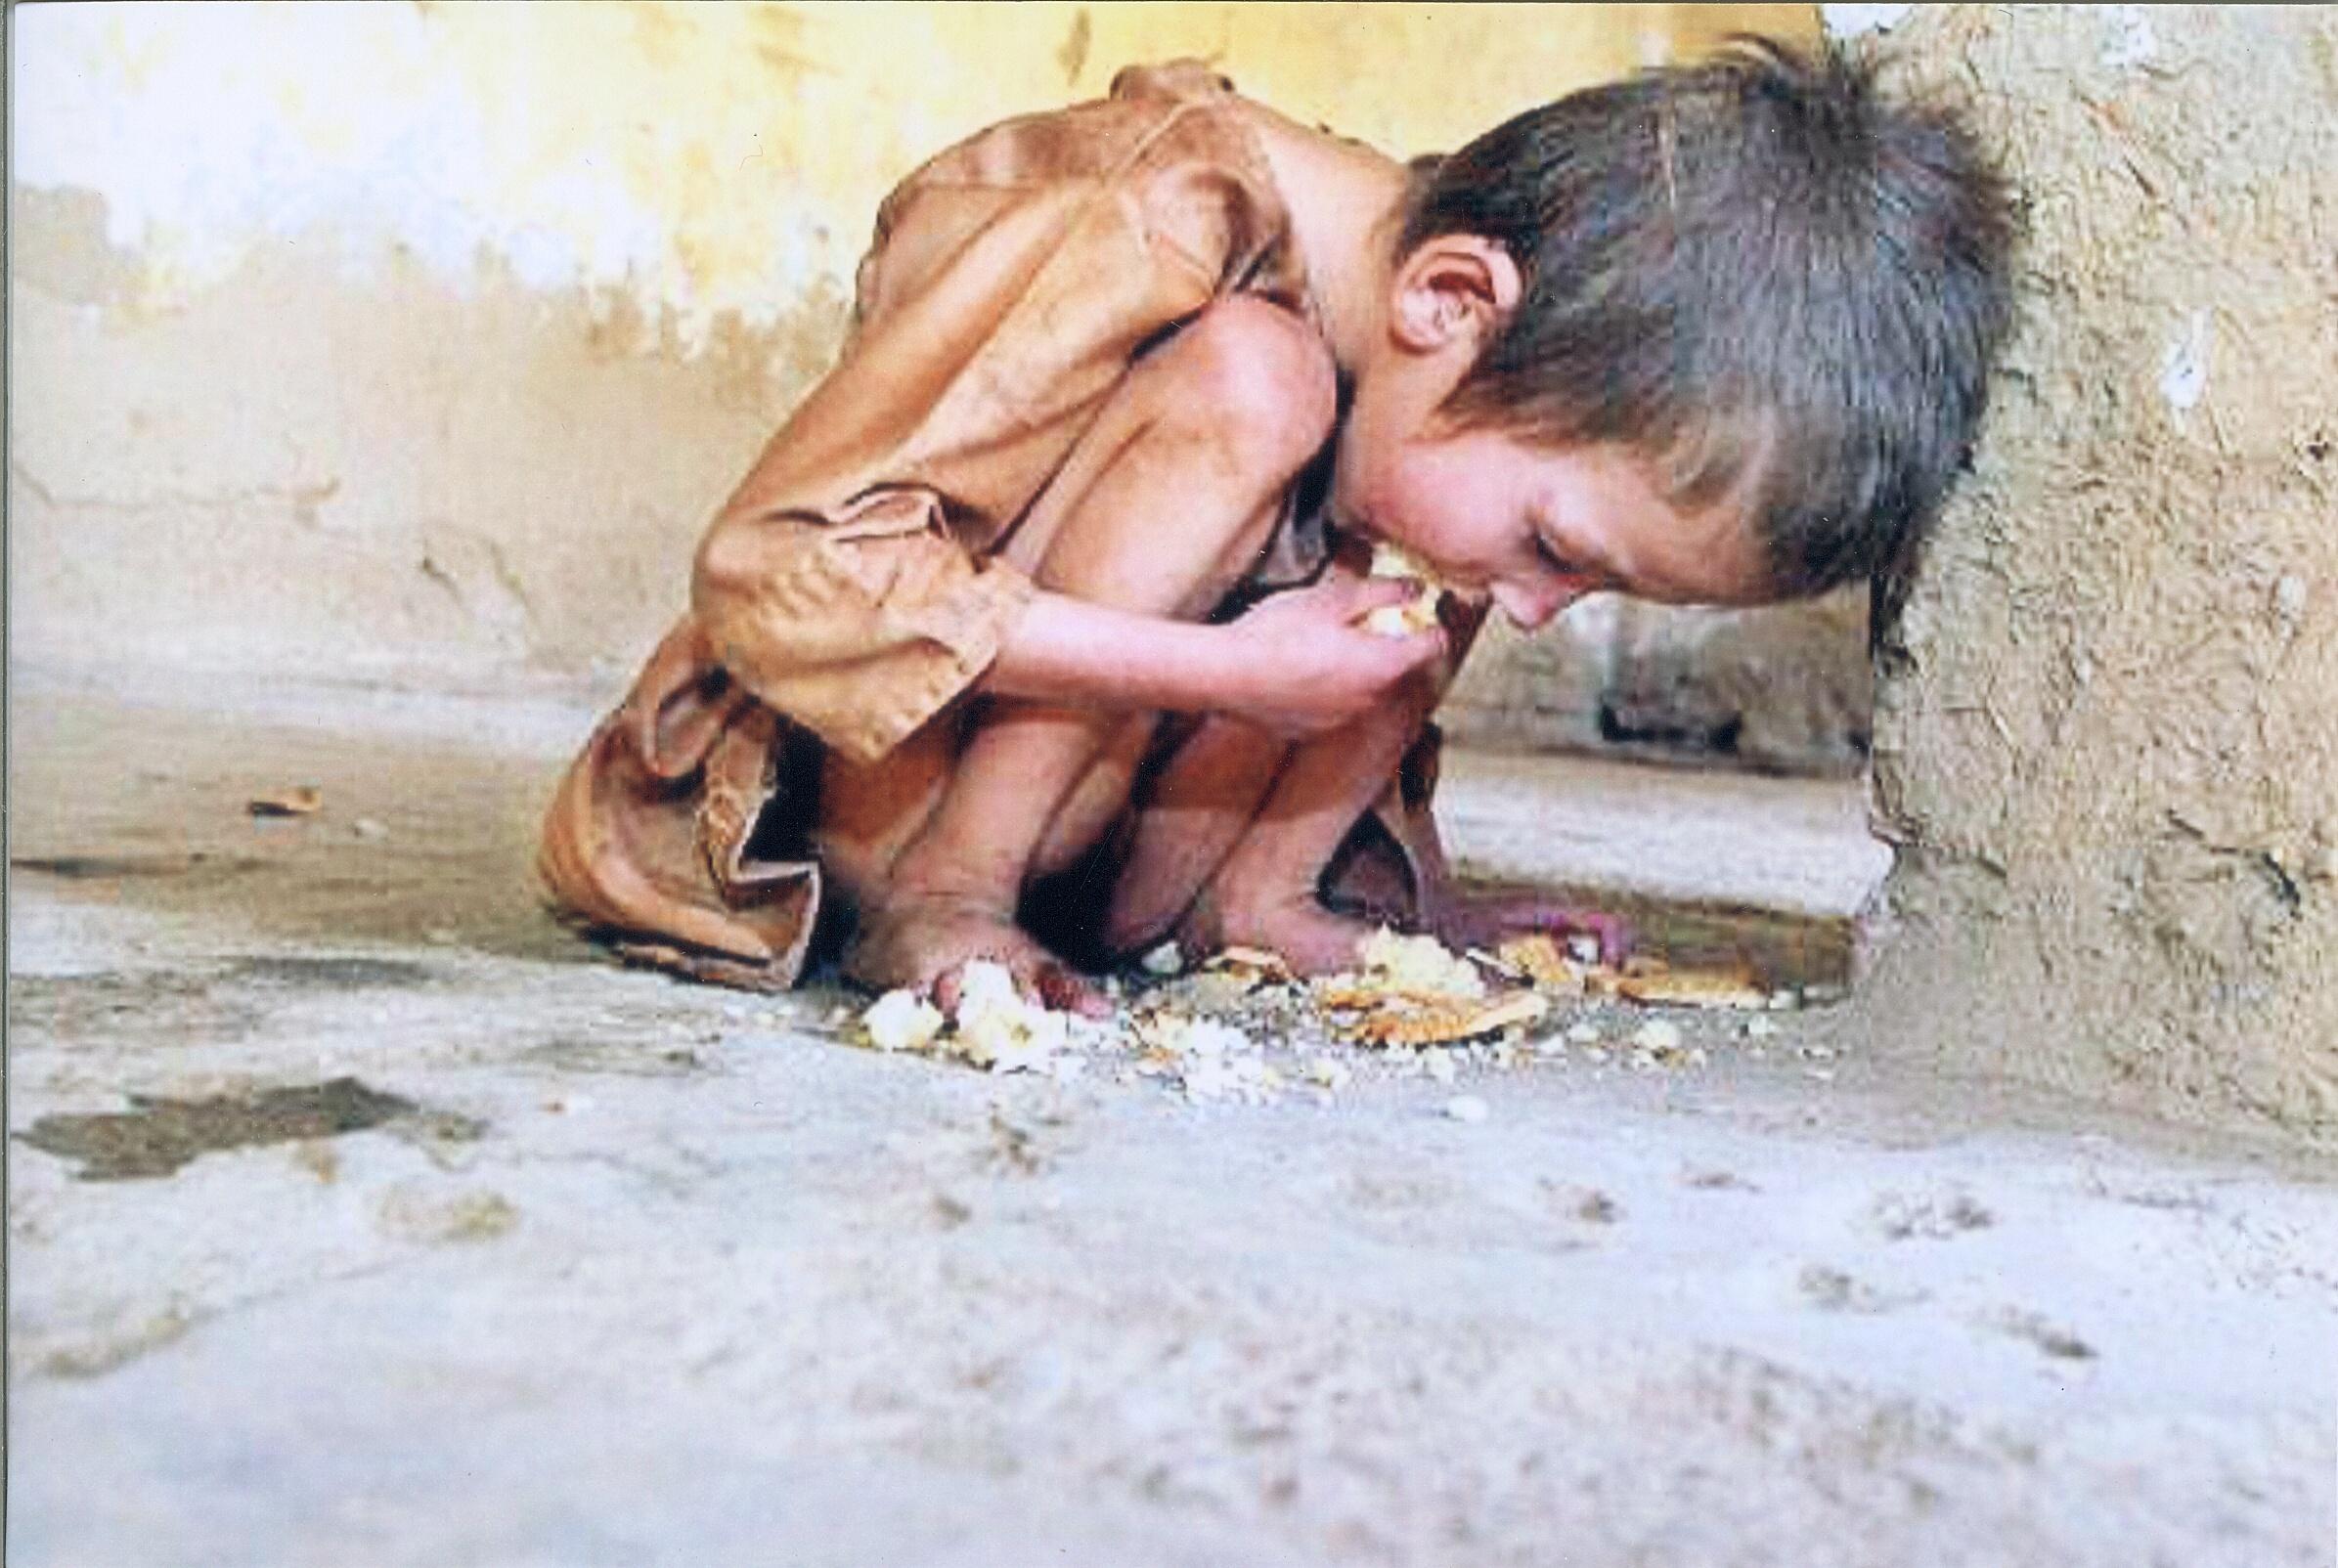 Orang Lapar